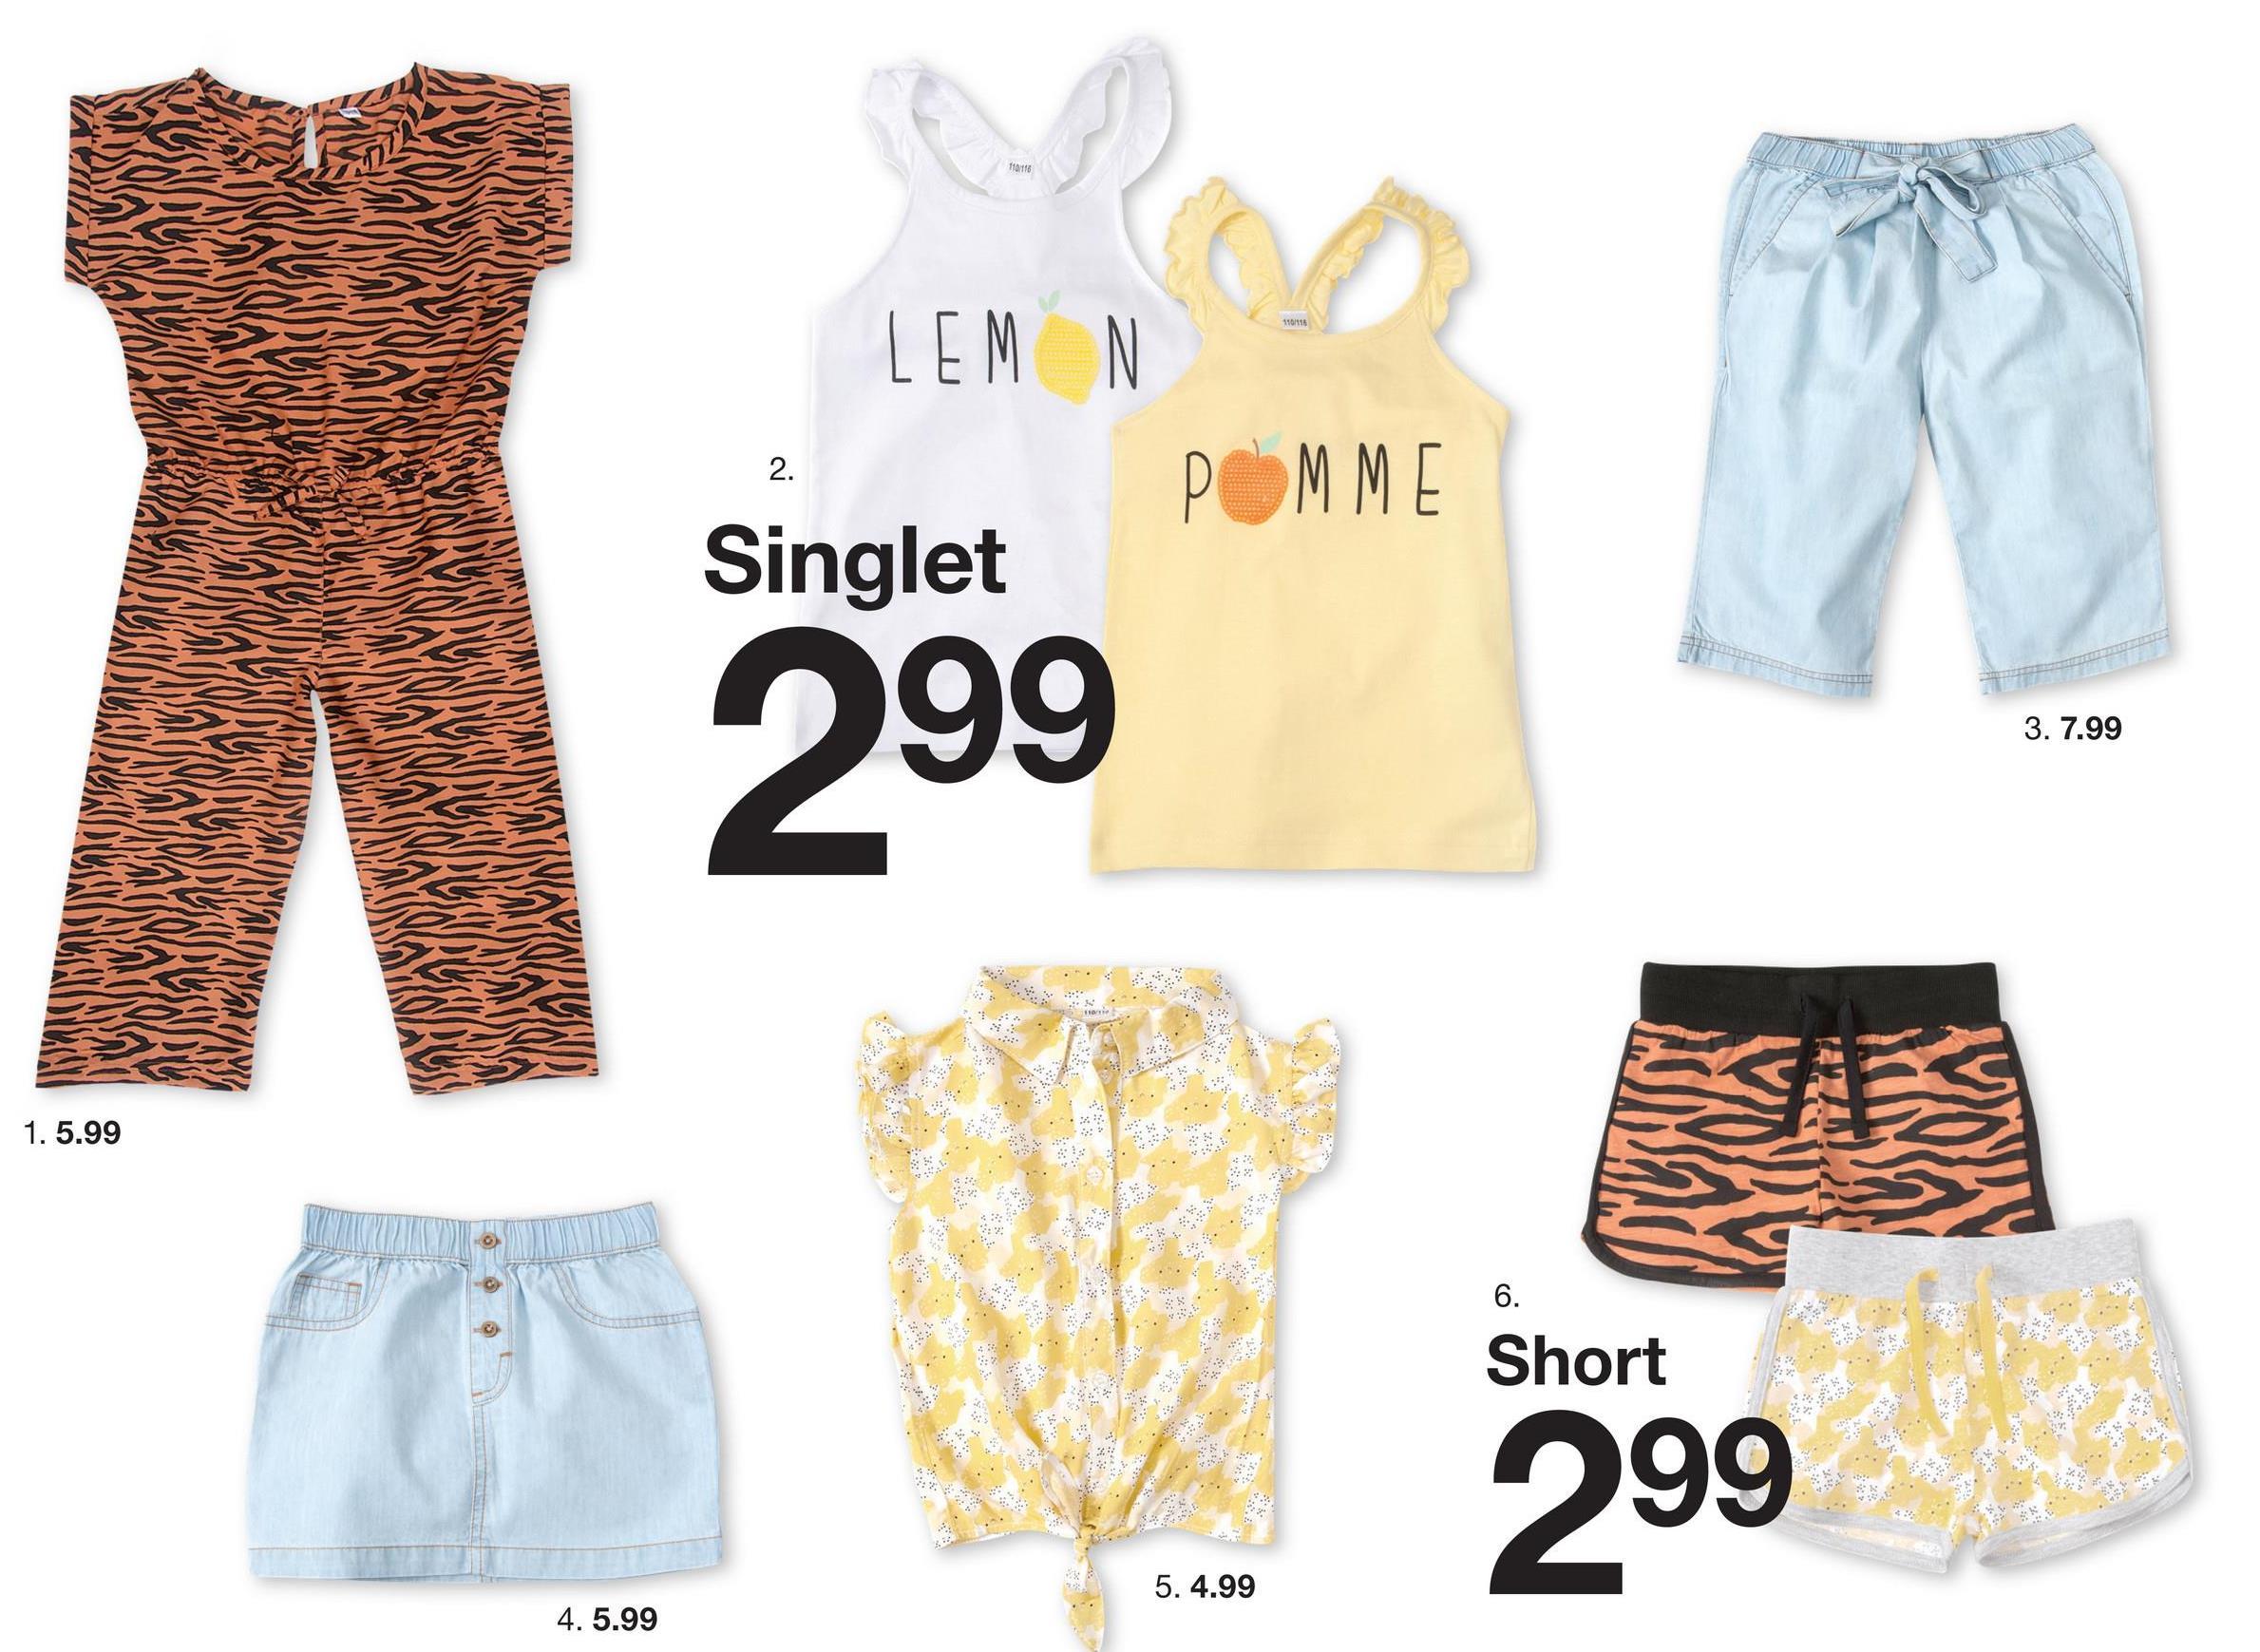 LEMN pММЕ Singlet 299 3. 7.99 1.5.99 Shorts 299 5. 4.99 4. 5.99